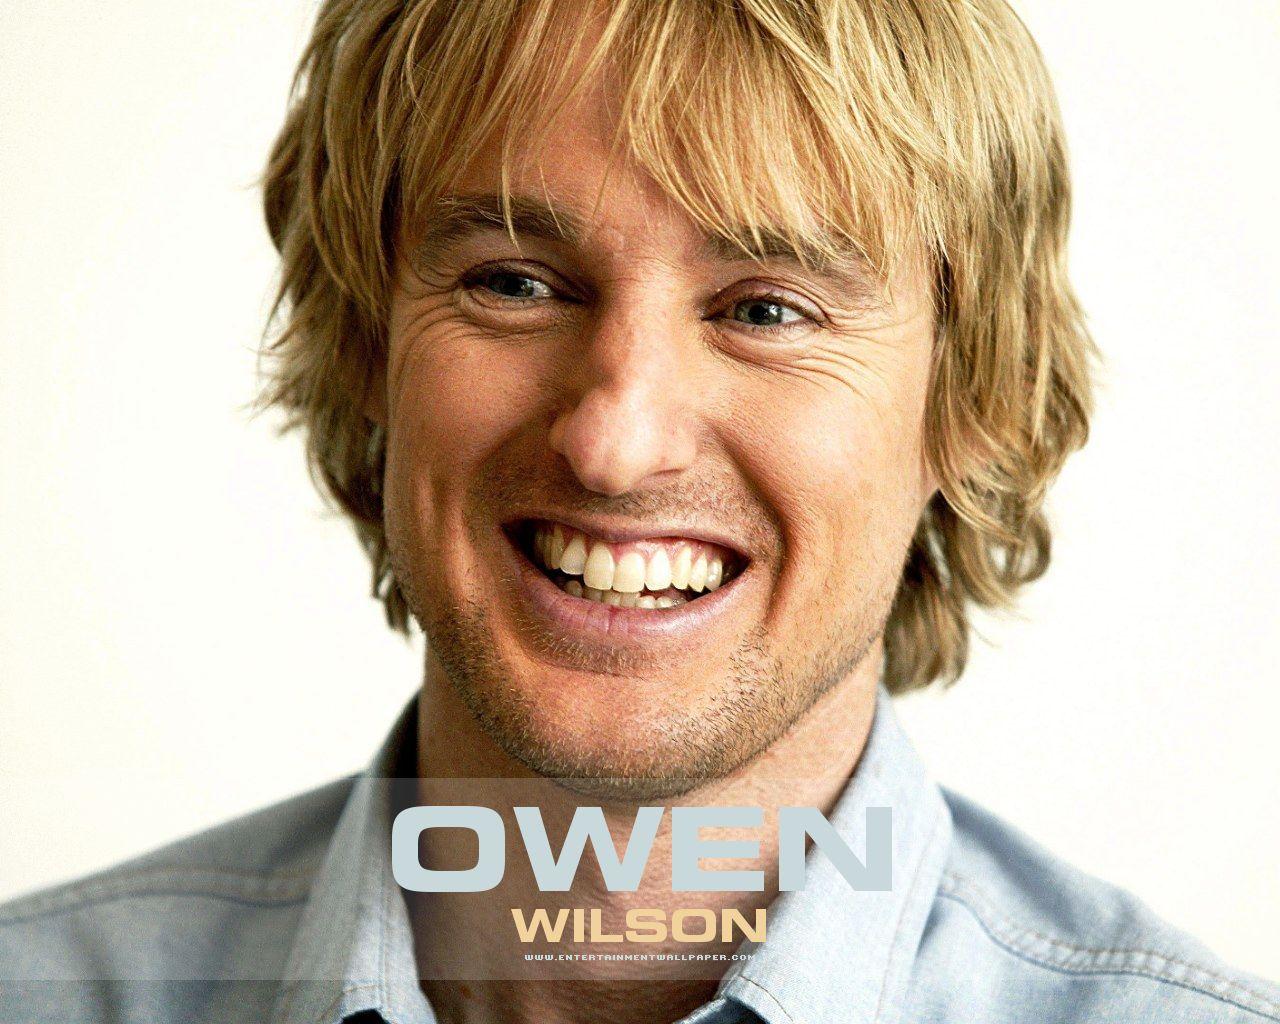 http://2.bp.blogspot.com/_BpAoKRSdVjQ/TIDLMYKWITI/AAAAAAAABPw/QsW5YIYhs30/s1600/owen-Wilson--celeb.jpg